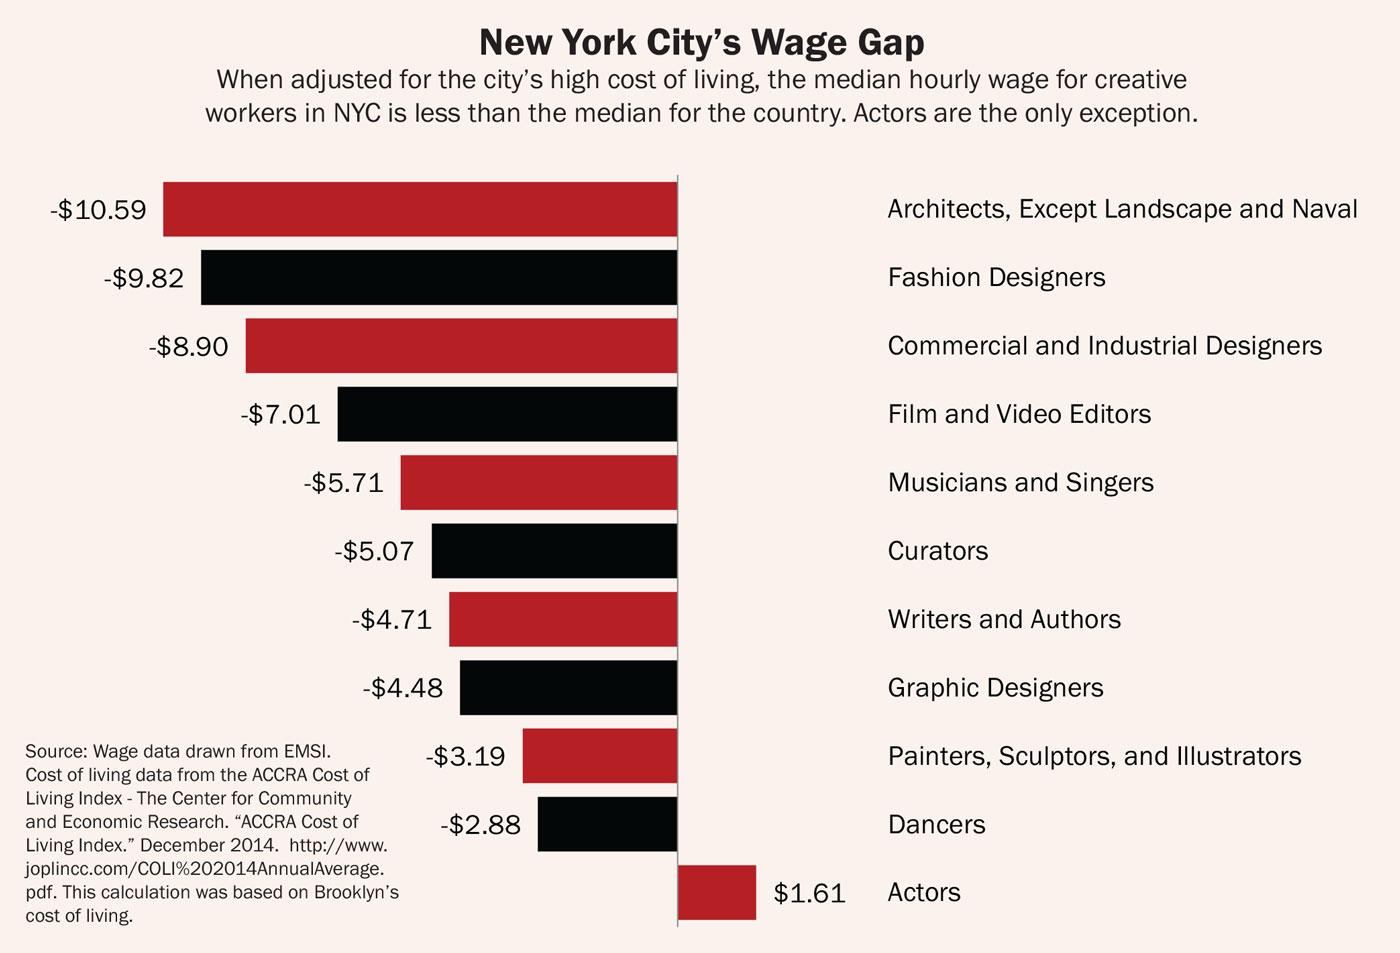 creative-new-york-new-yorks-wage-gap